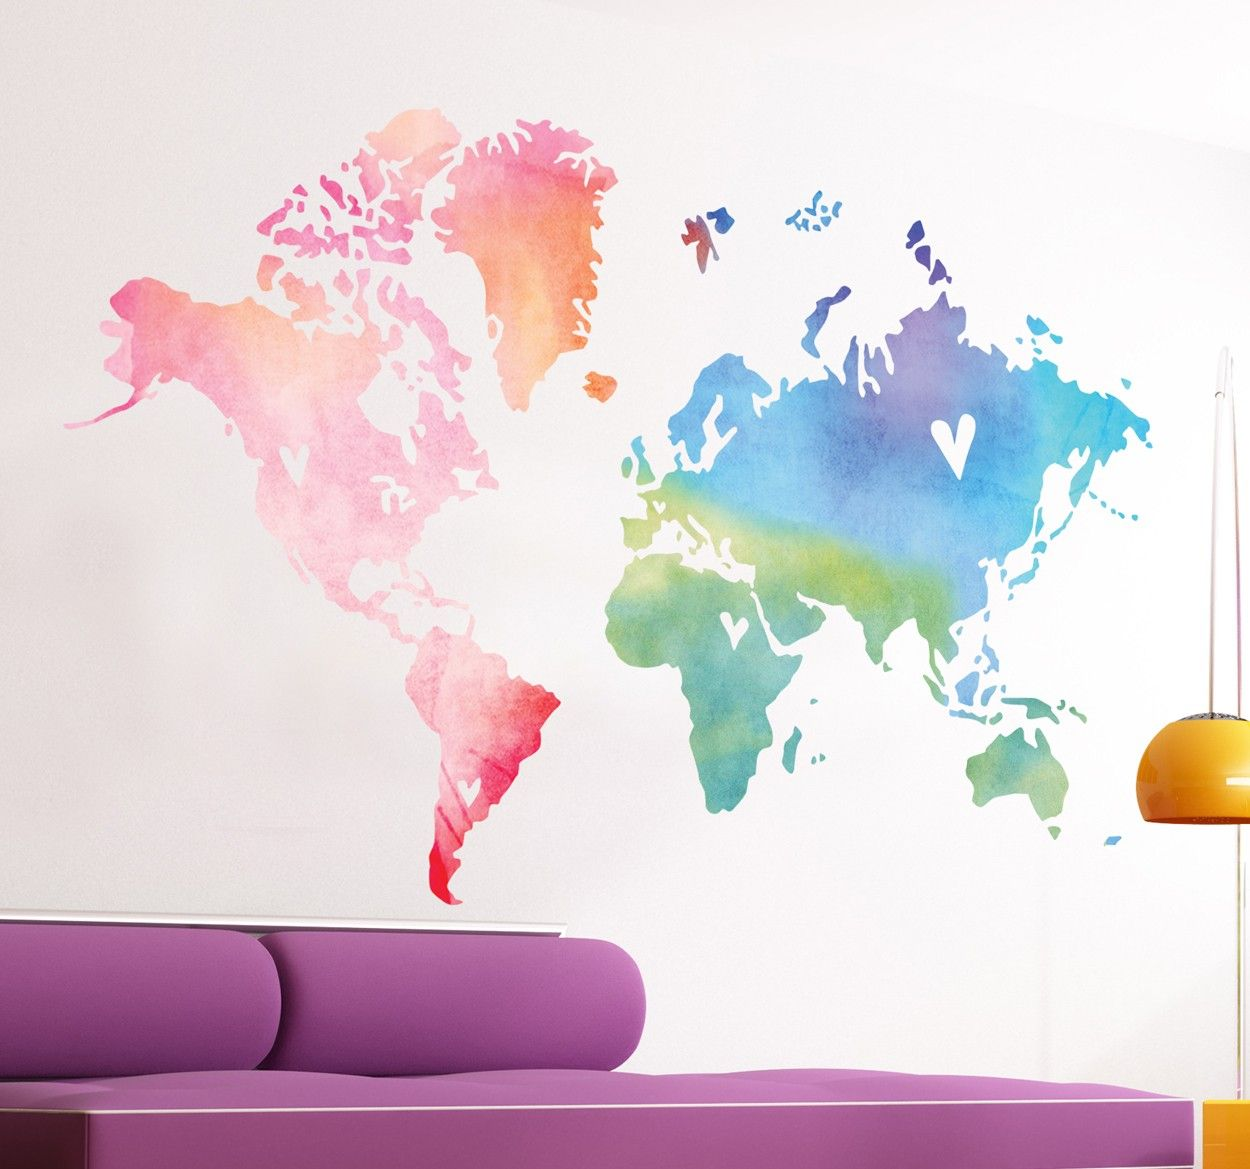 sticker carte du monde aquarelle cartes monde multicolore pinterest carte du monde. Black Bedroom Furniture Sets. Home Design Ideas